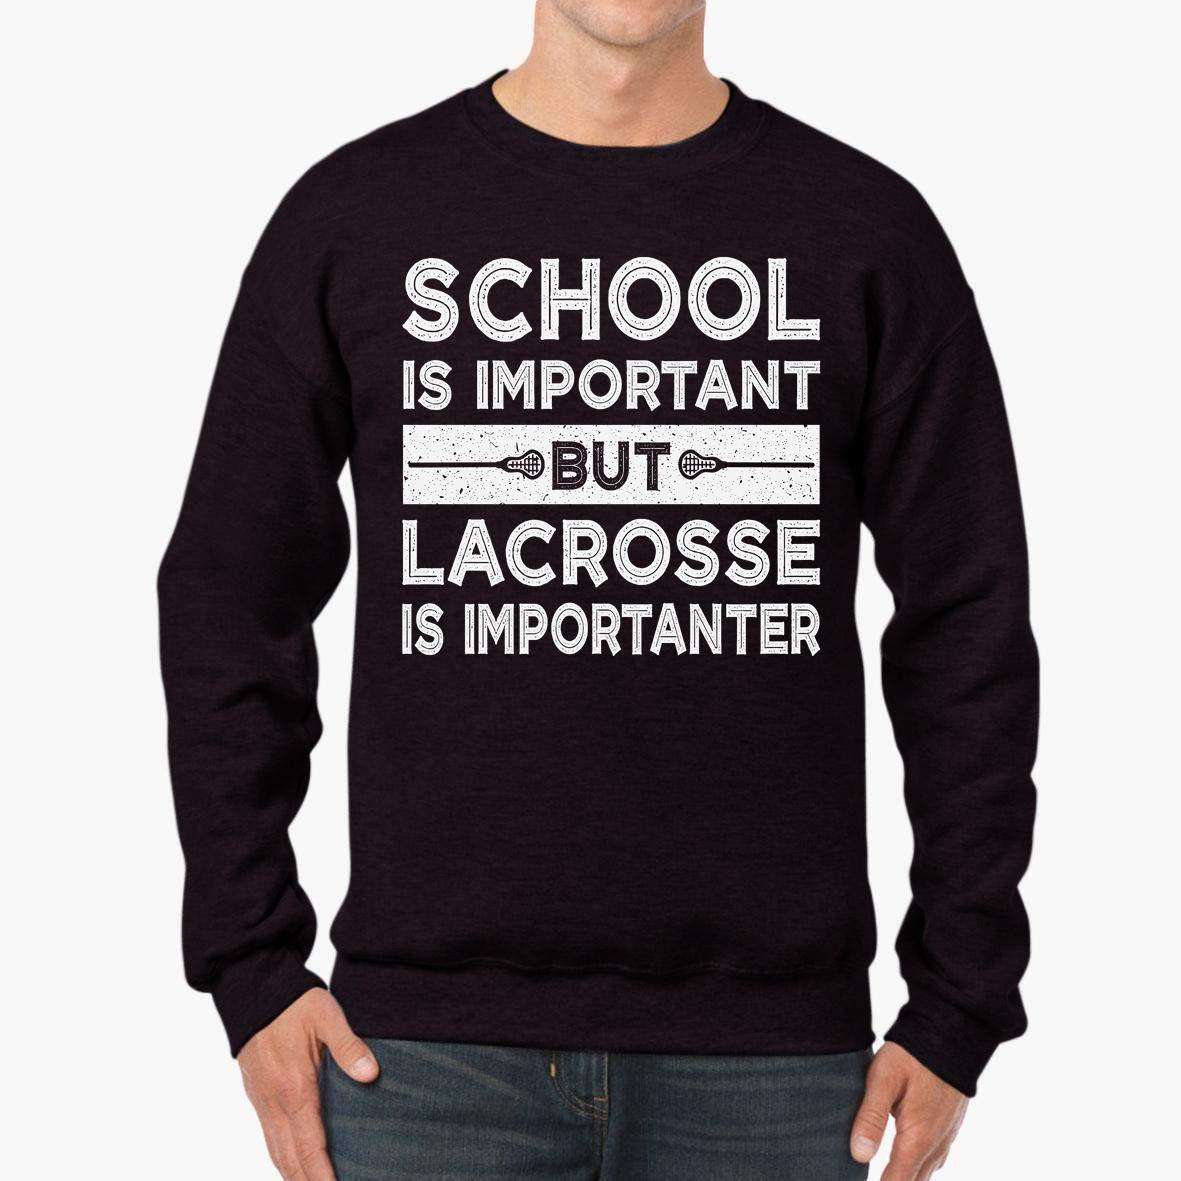 tee School is Important but Lacrosse is Importanter Unisex Sweatshirt